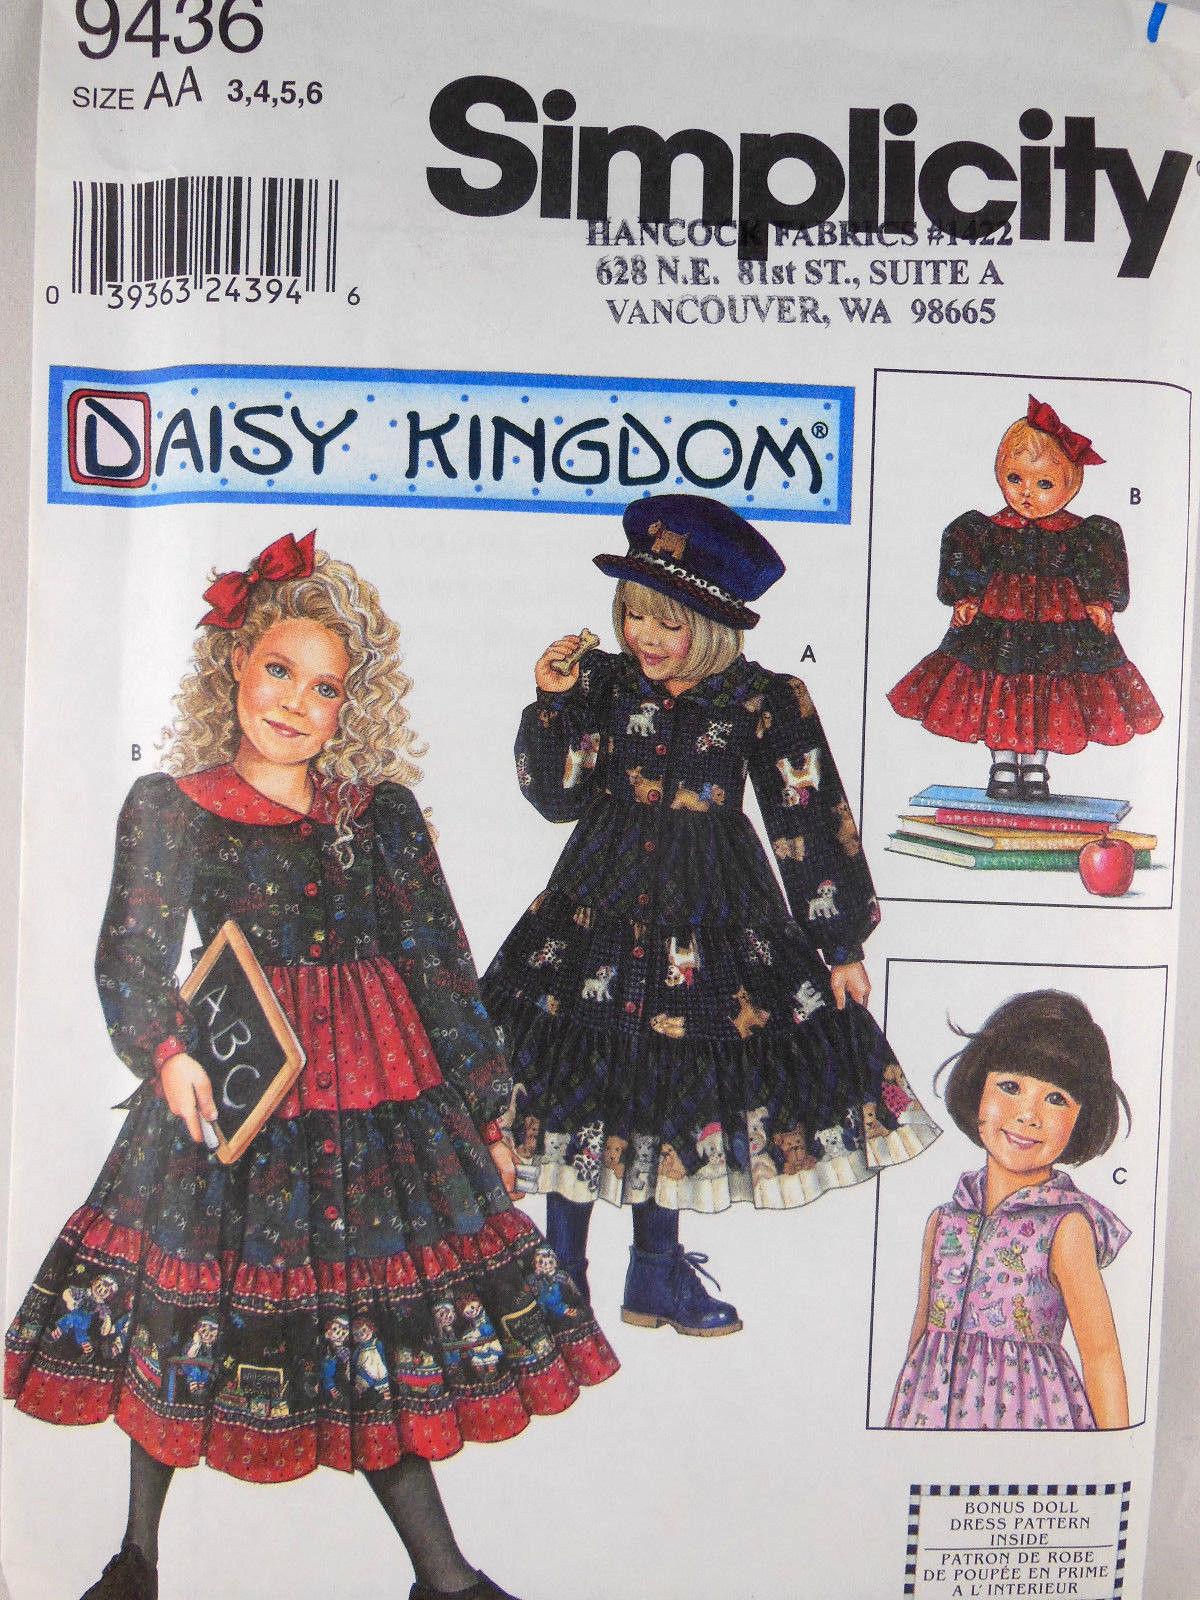 "DAISY KINGDOM girls & 18"" DOLL TIERED DRESS w Hood Pattern 9436 3 4 5 6 UNCUT FF - $5.53"